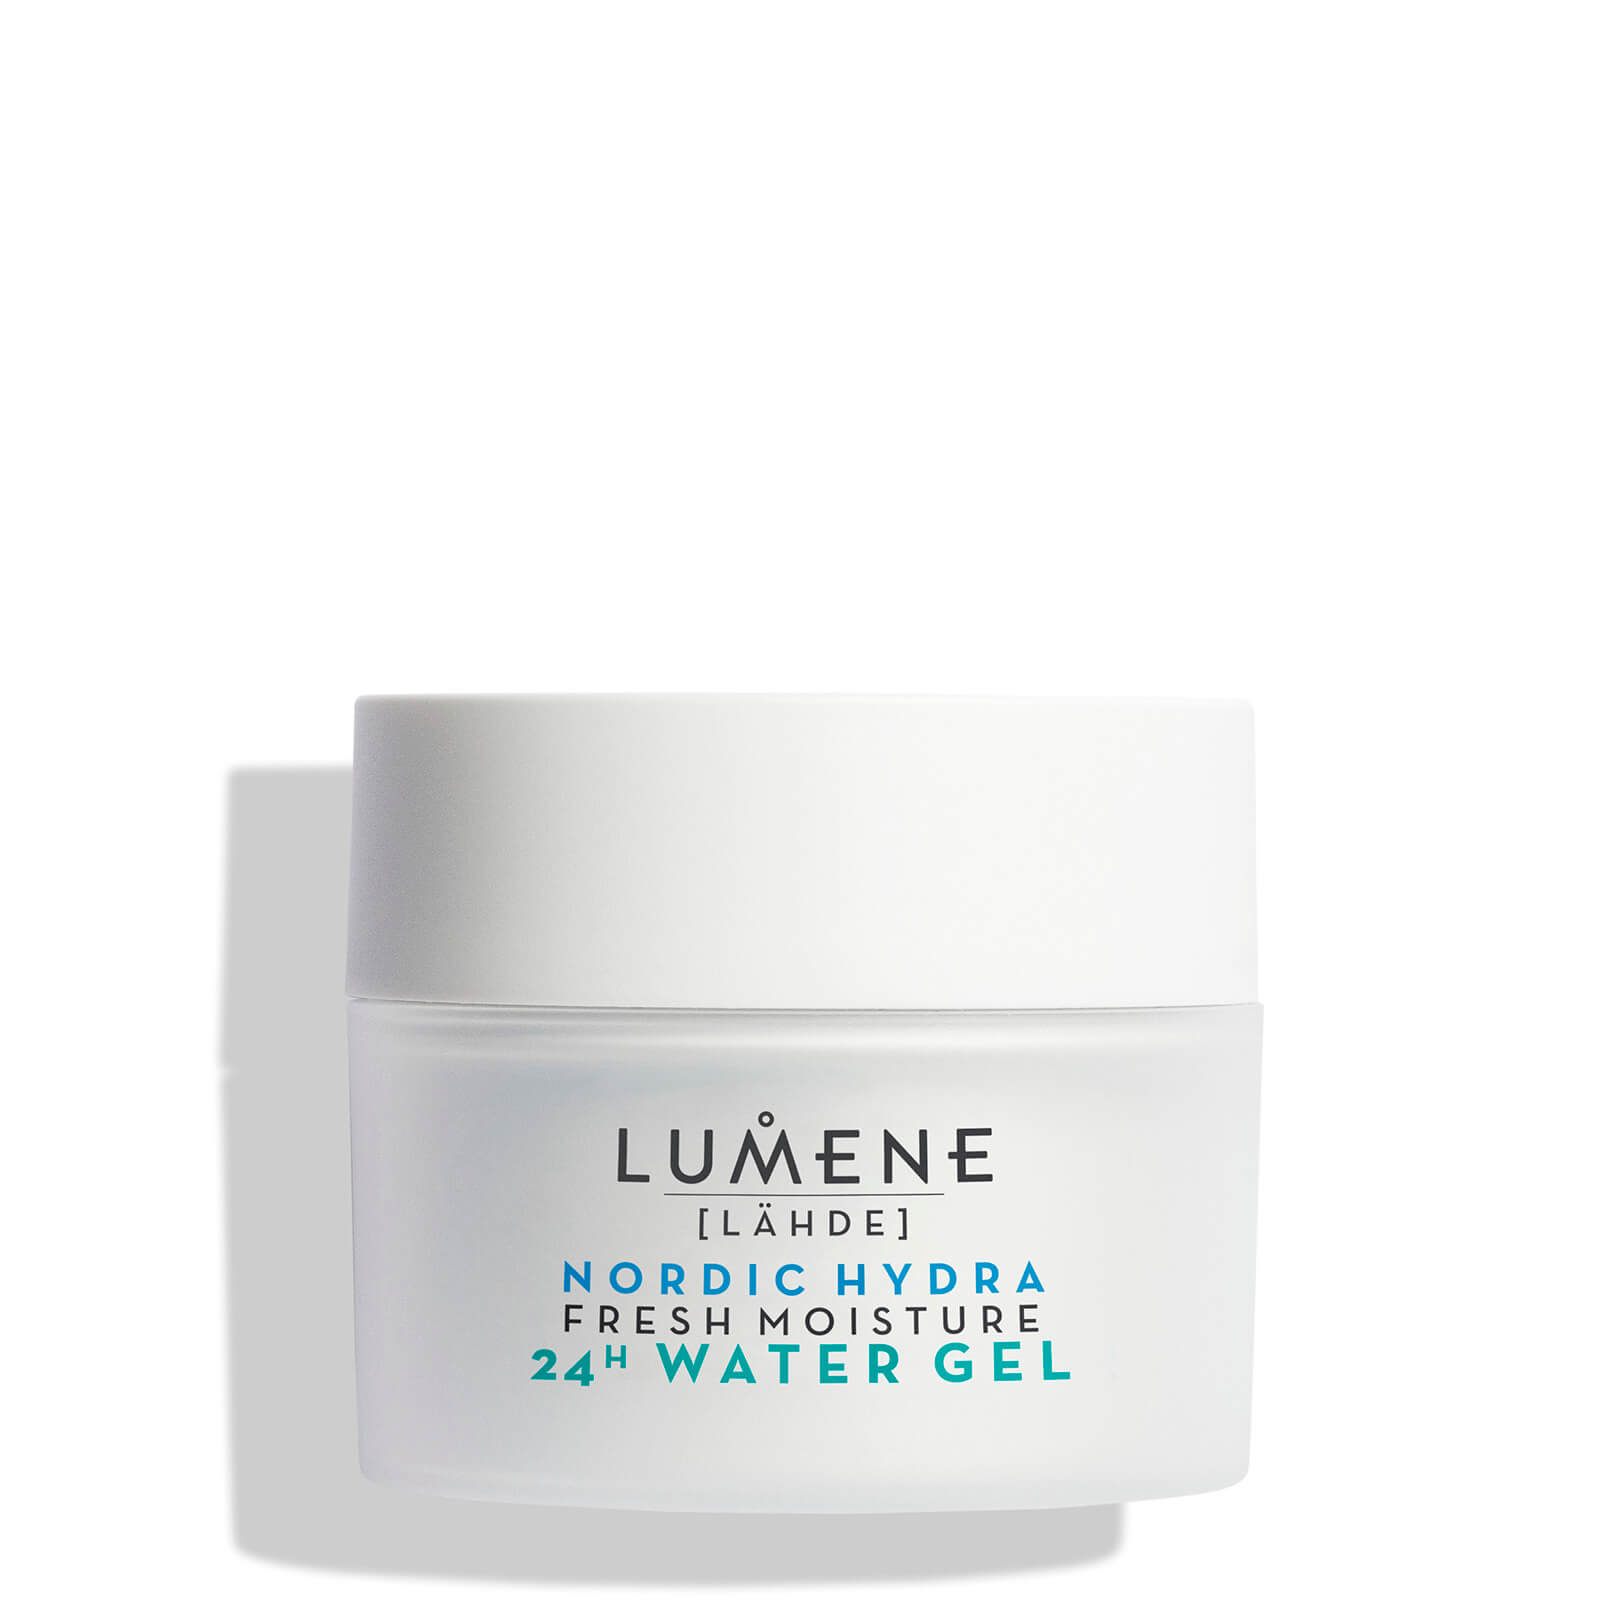 Купить Lumene Nordic Hydra [LAHDE] Fresh Moisture 24H Water Gel 50ml